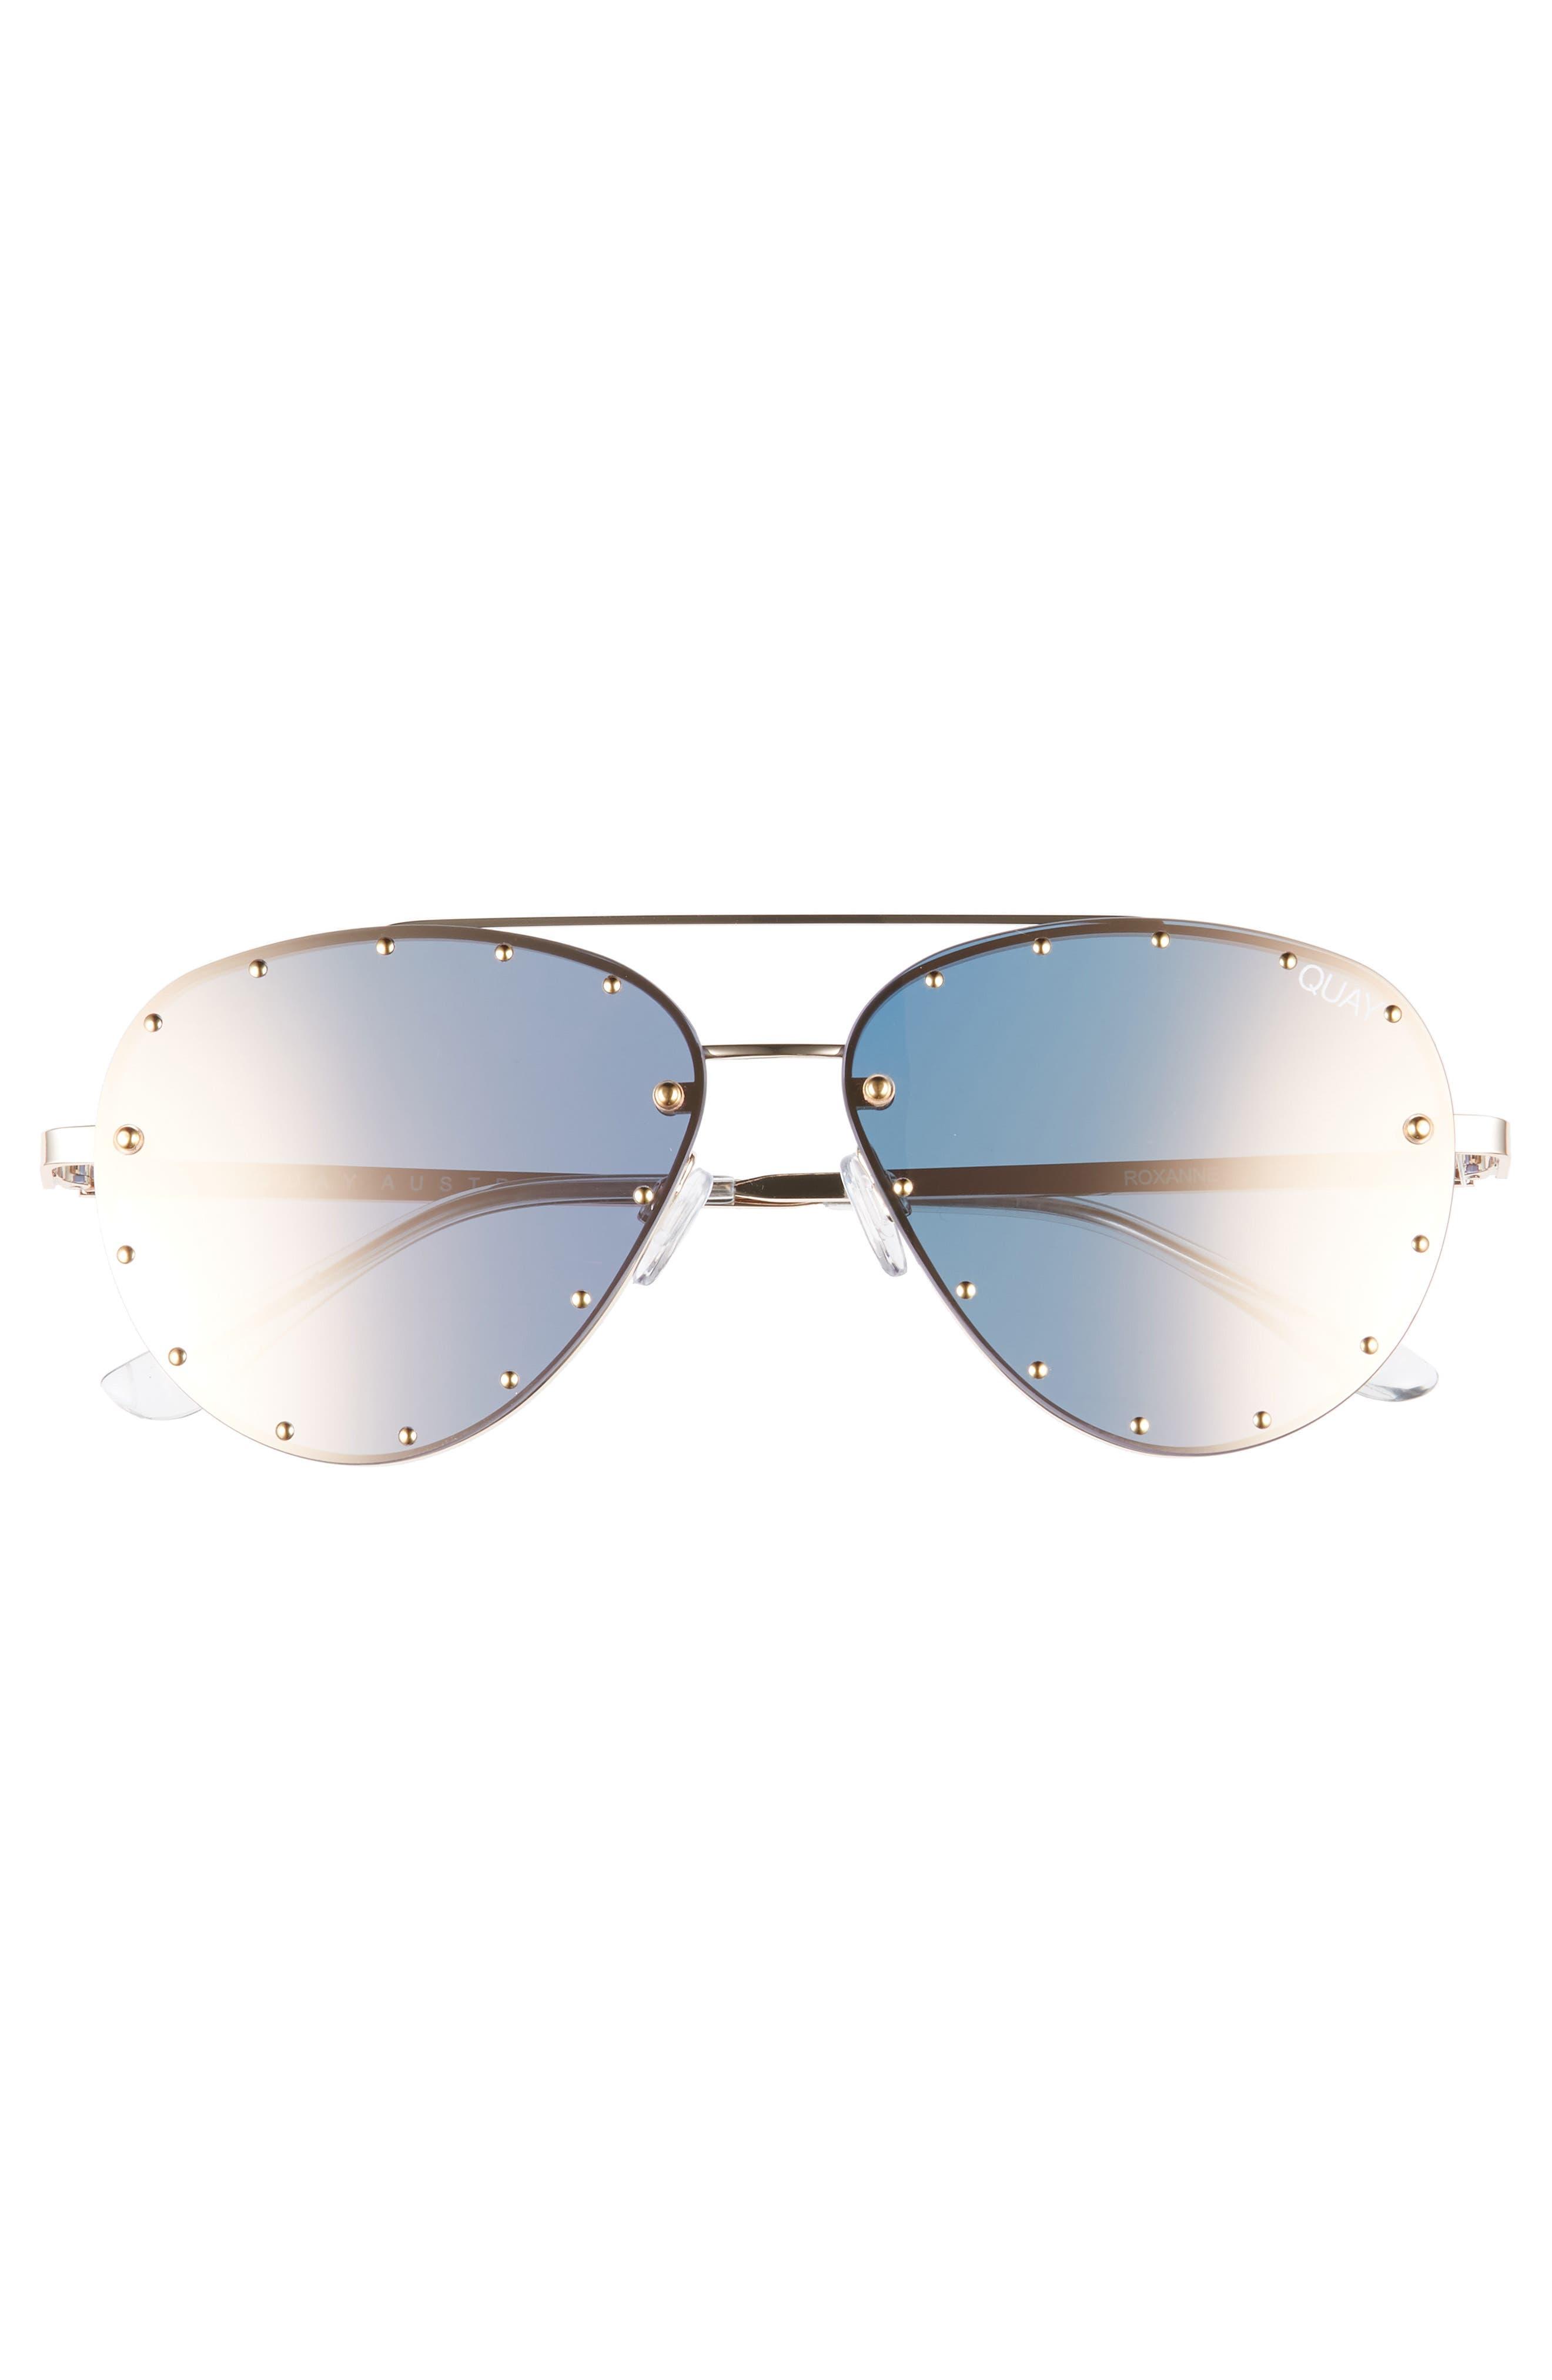 x Jaclyn Hill Roxanne 62mm Stud Aviator Sunglasses,                             Alternate thumbnail 5, color,                             GOLD / ROSE